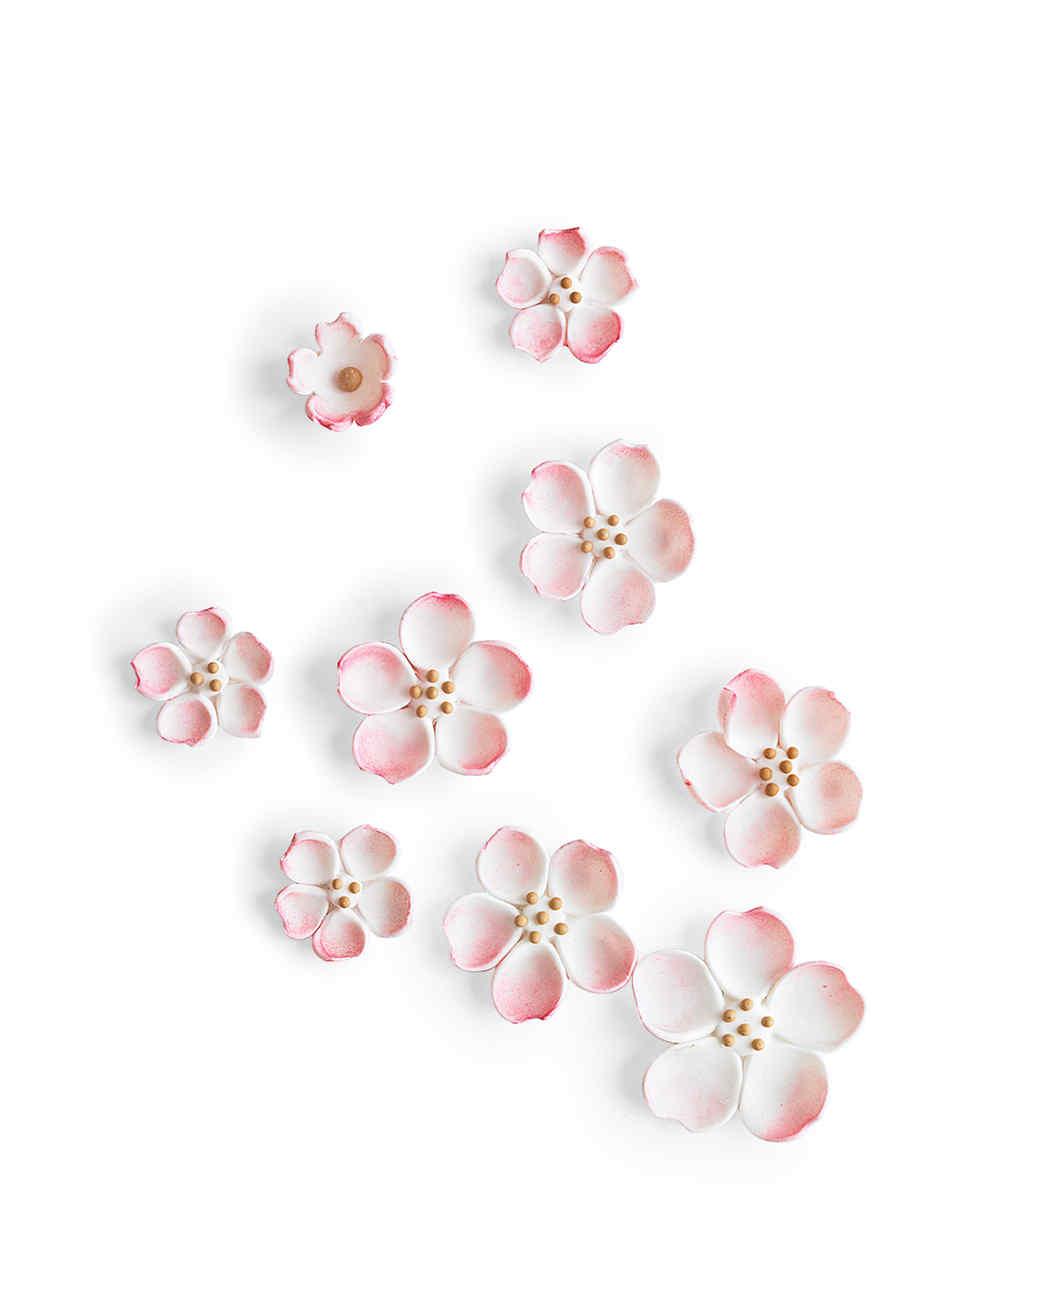 Edible Cherry Blossoms